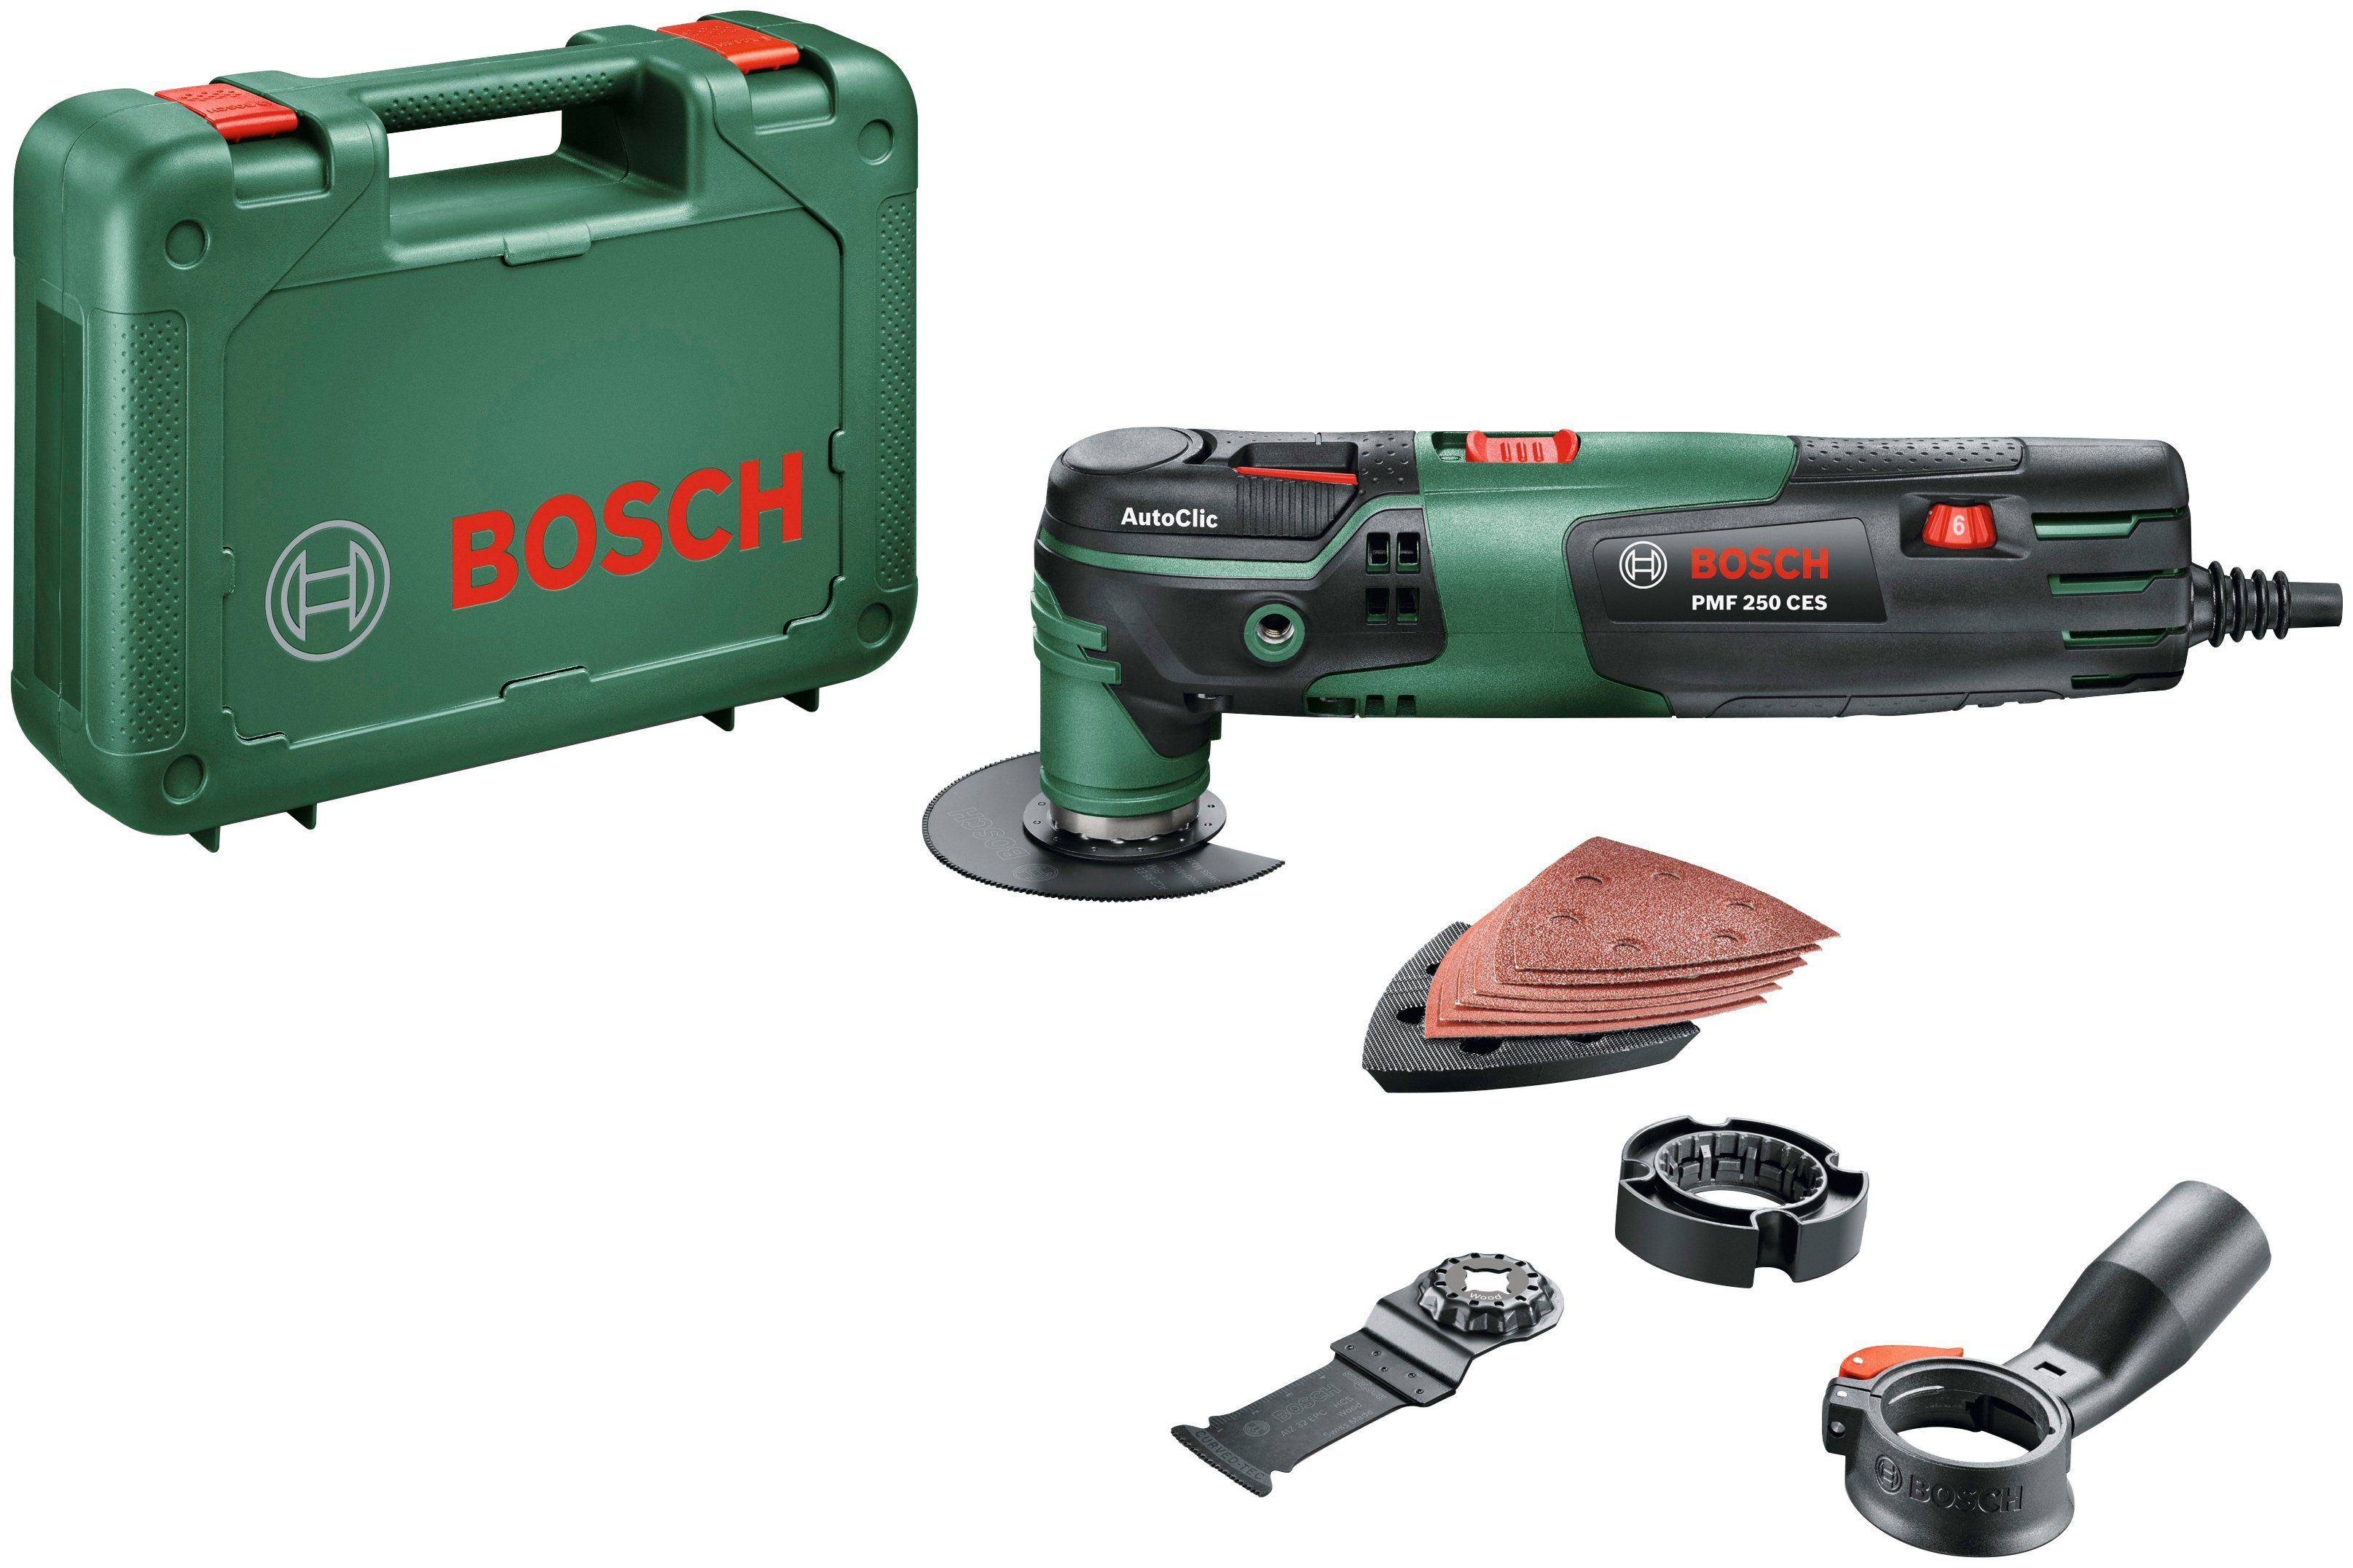 Bosch Multifunktionswerkzeug »PMF 250 CES «